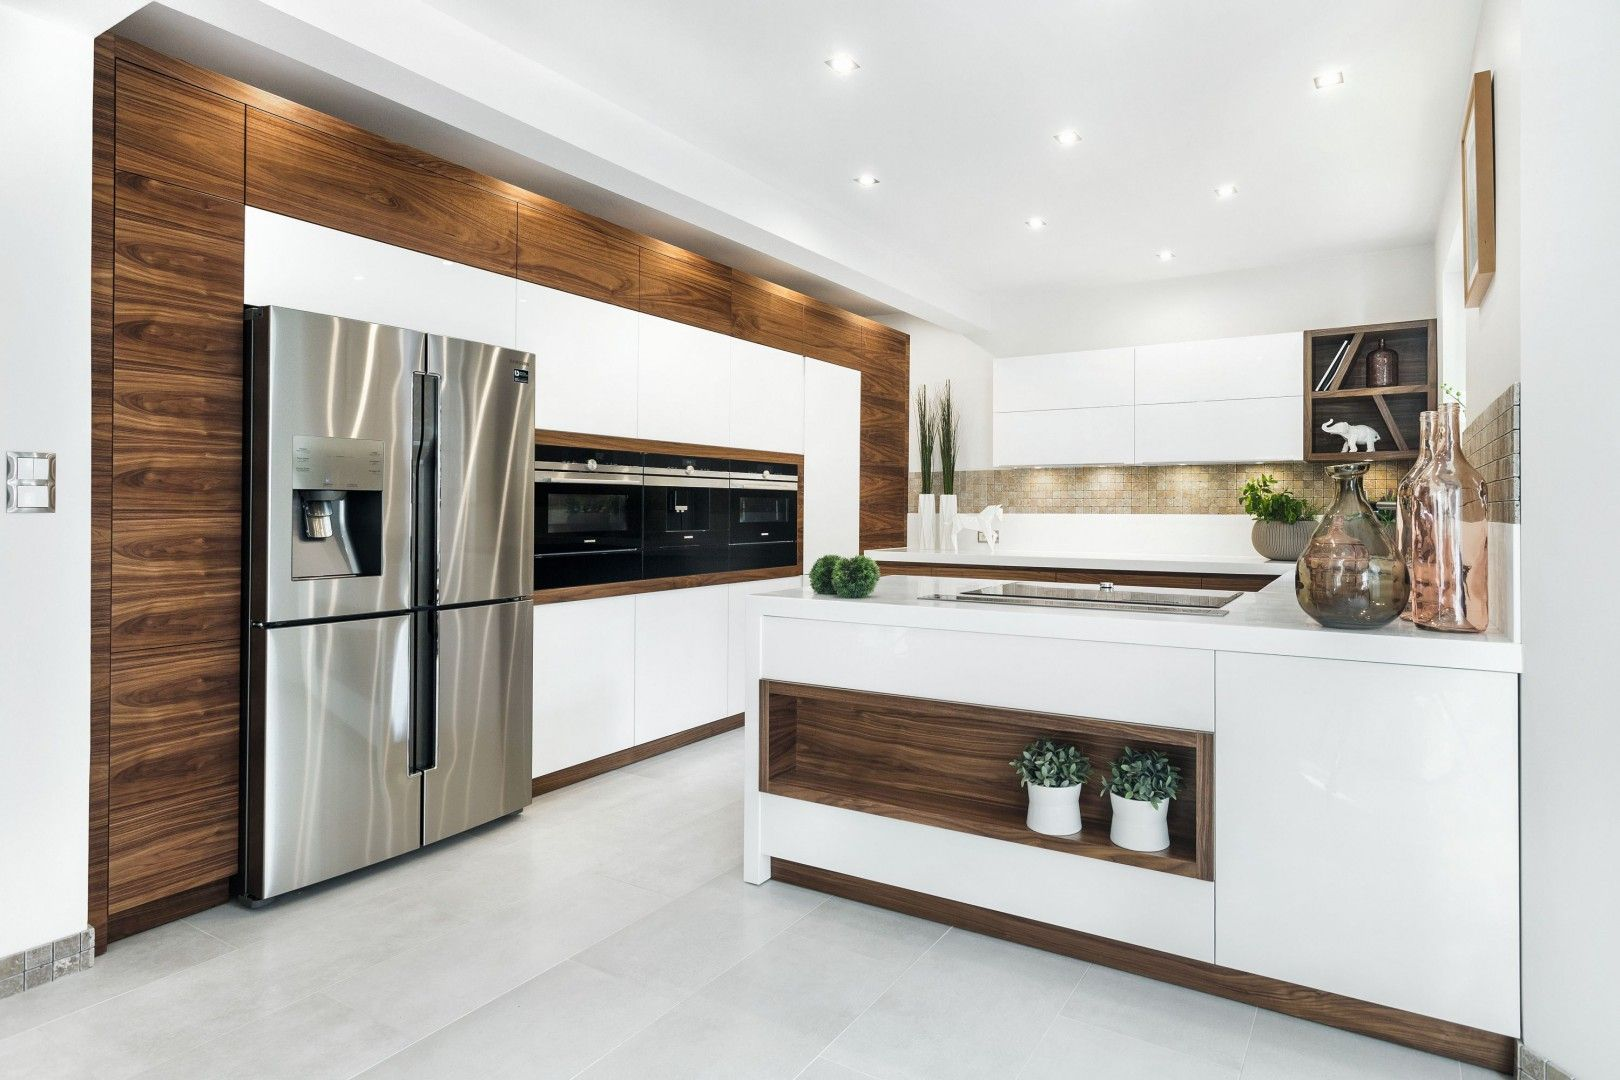 Trendy 2018 Drewno W Kuchni Projekt Vigo Fot Artur Krupa Kitchen Window Design European Kitchen Design Modern Kitchen Design